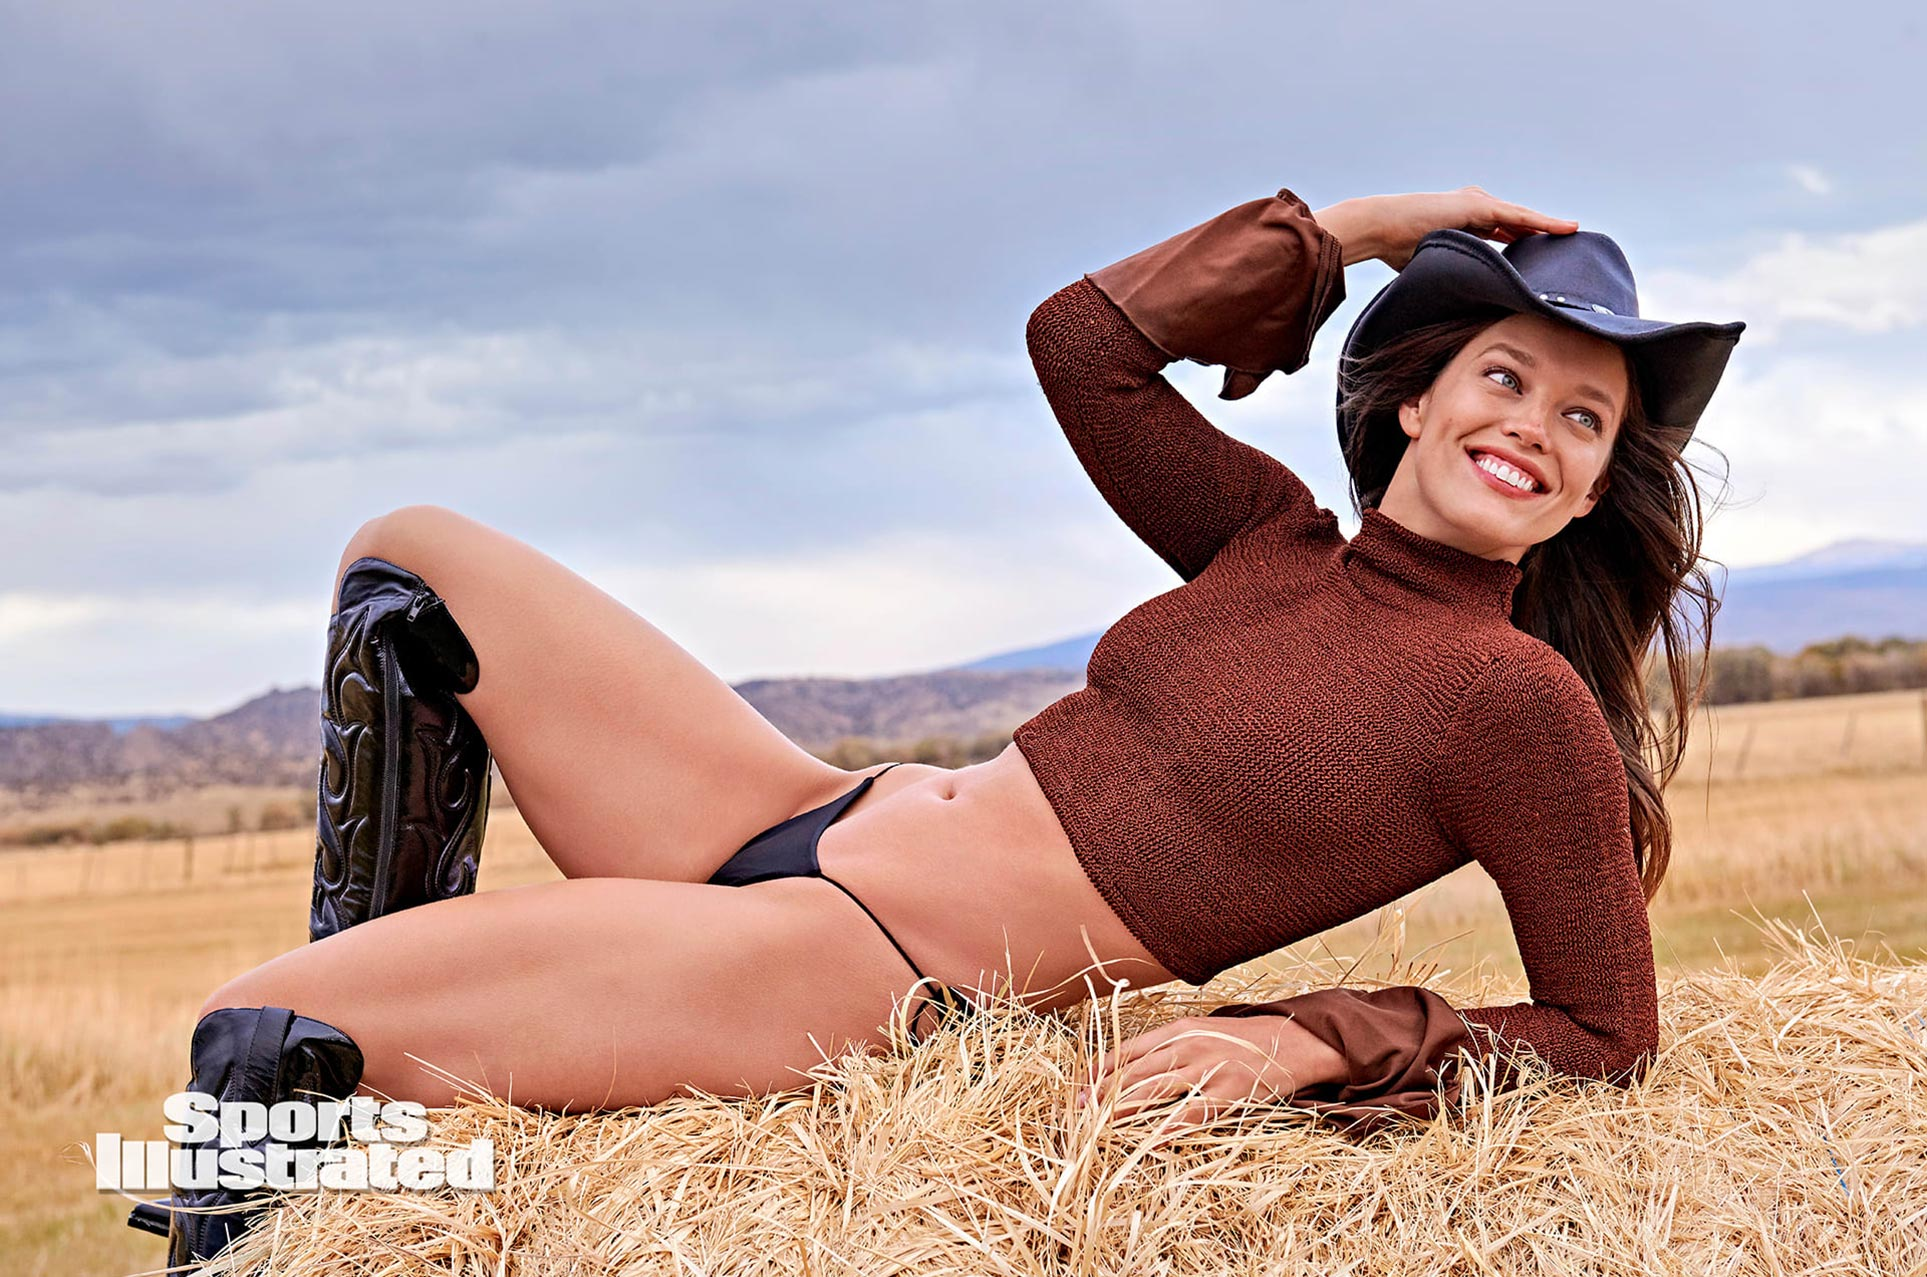 Эмили ДиДонато в каталоге купальников Sports Illustrated Swimsuit 2020 / фото 09